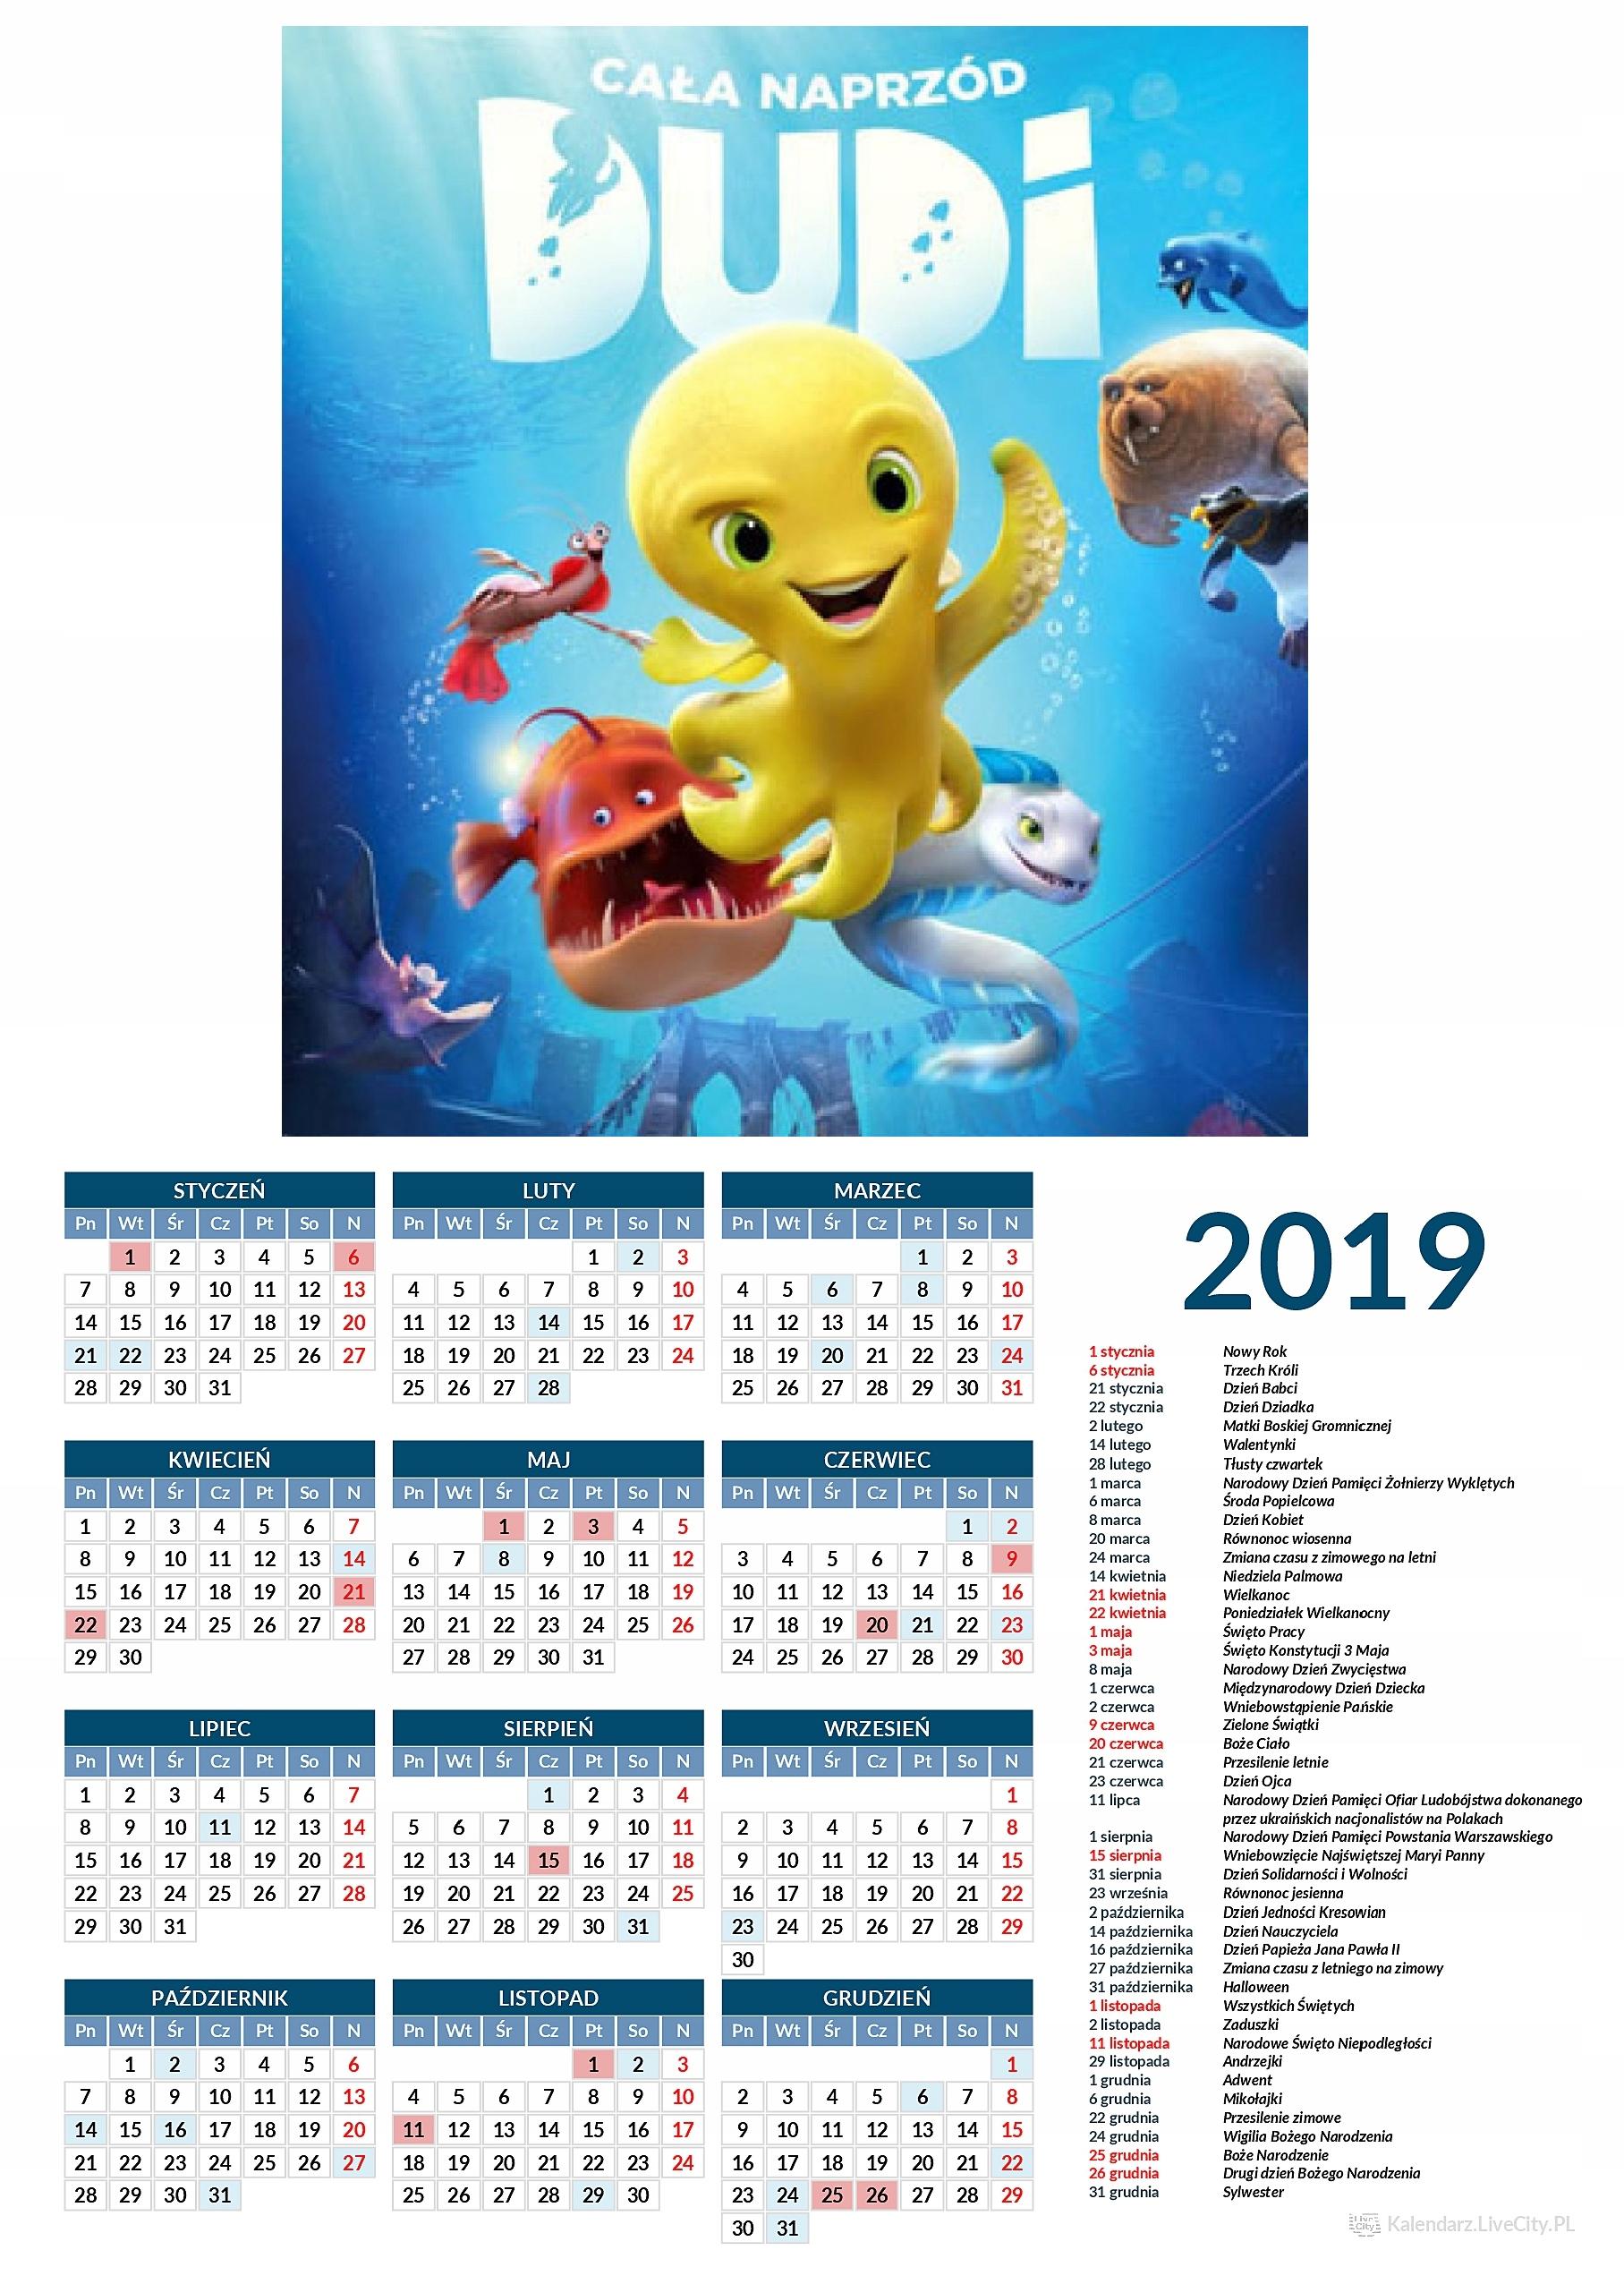 Kalendarz 2019 film Dudi cała naprzód